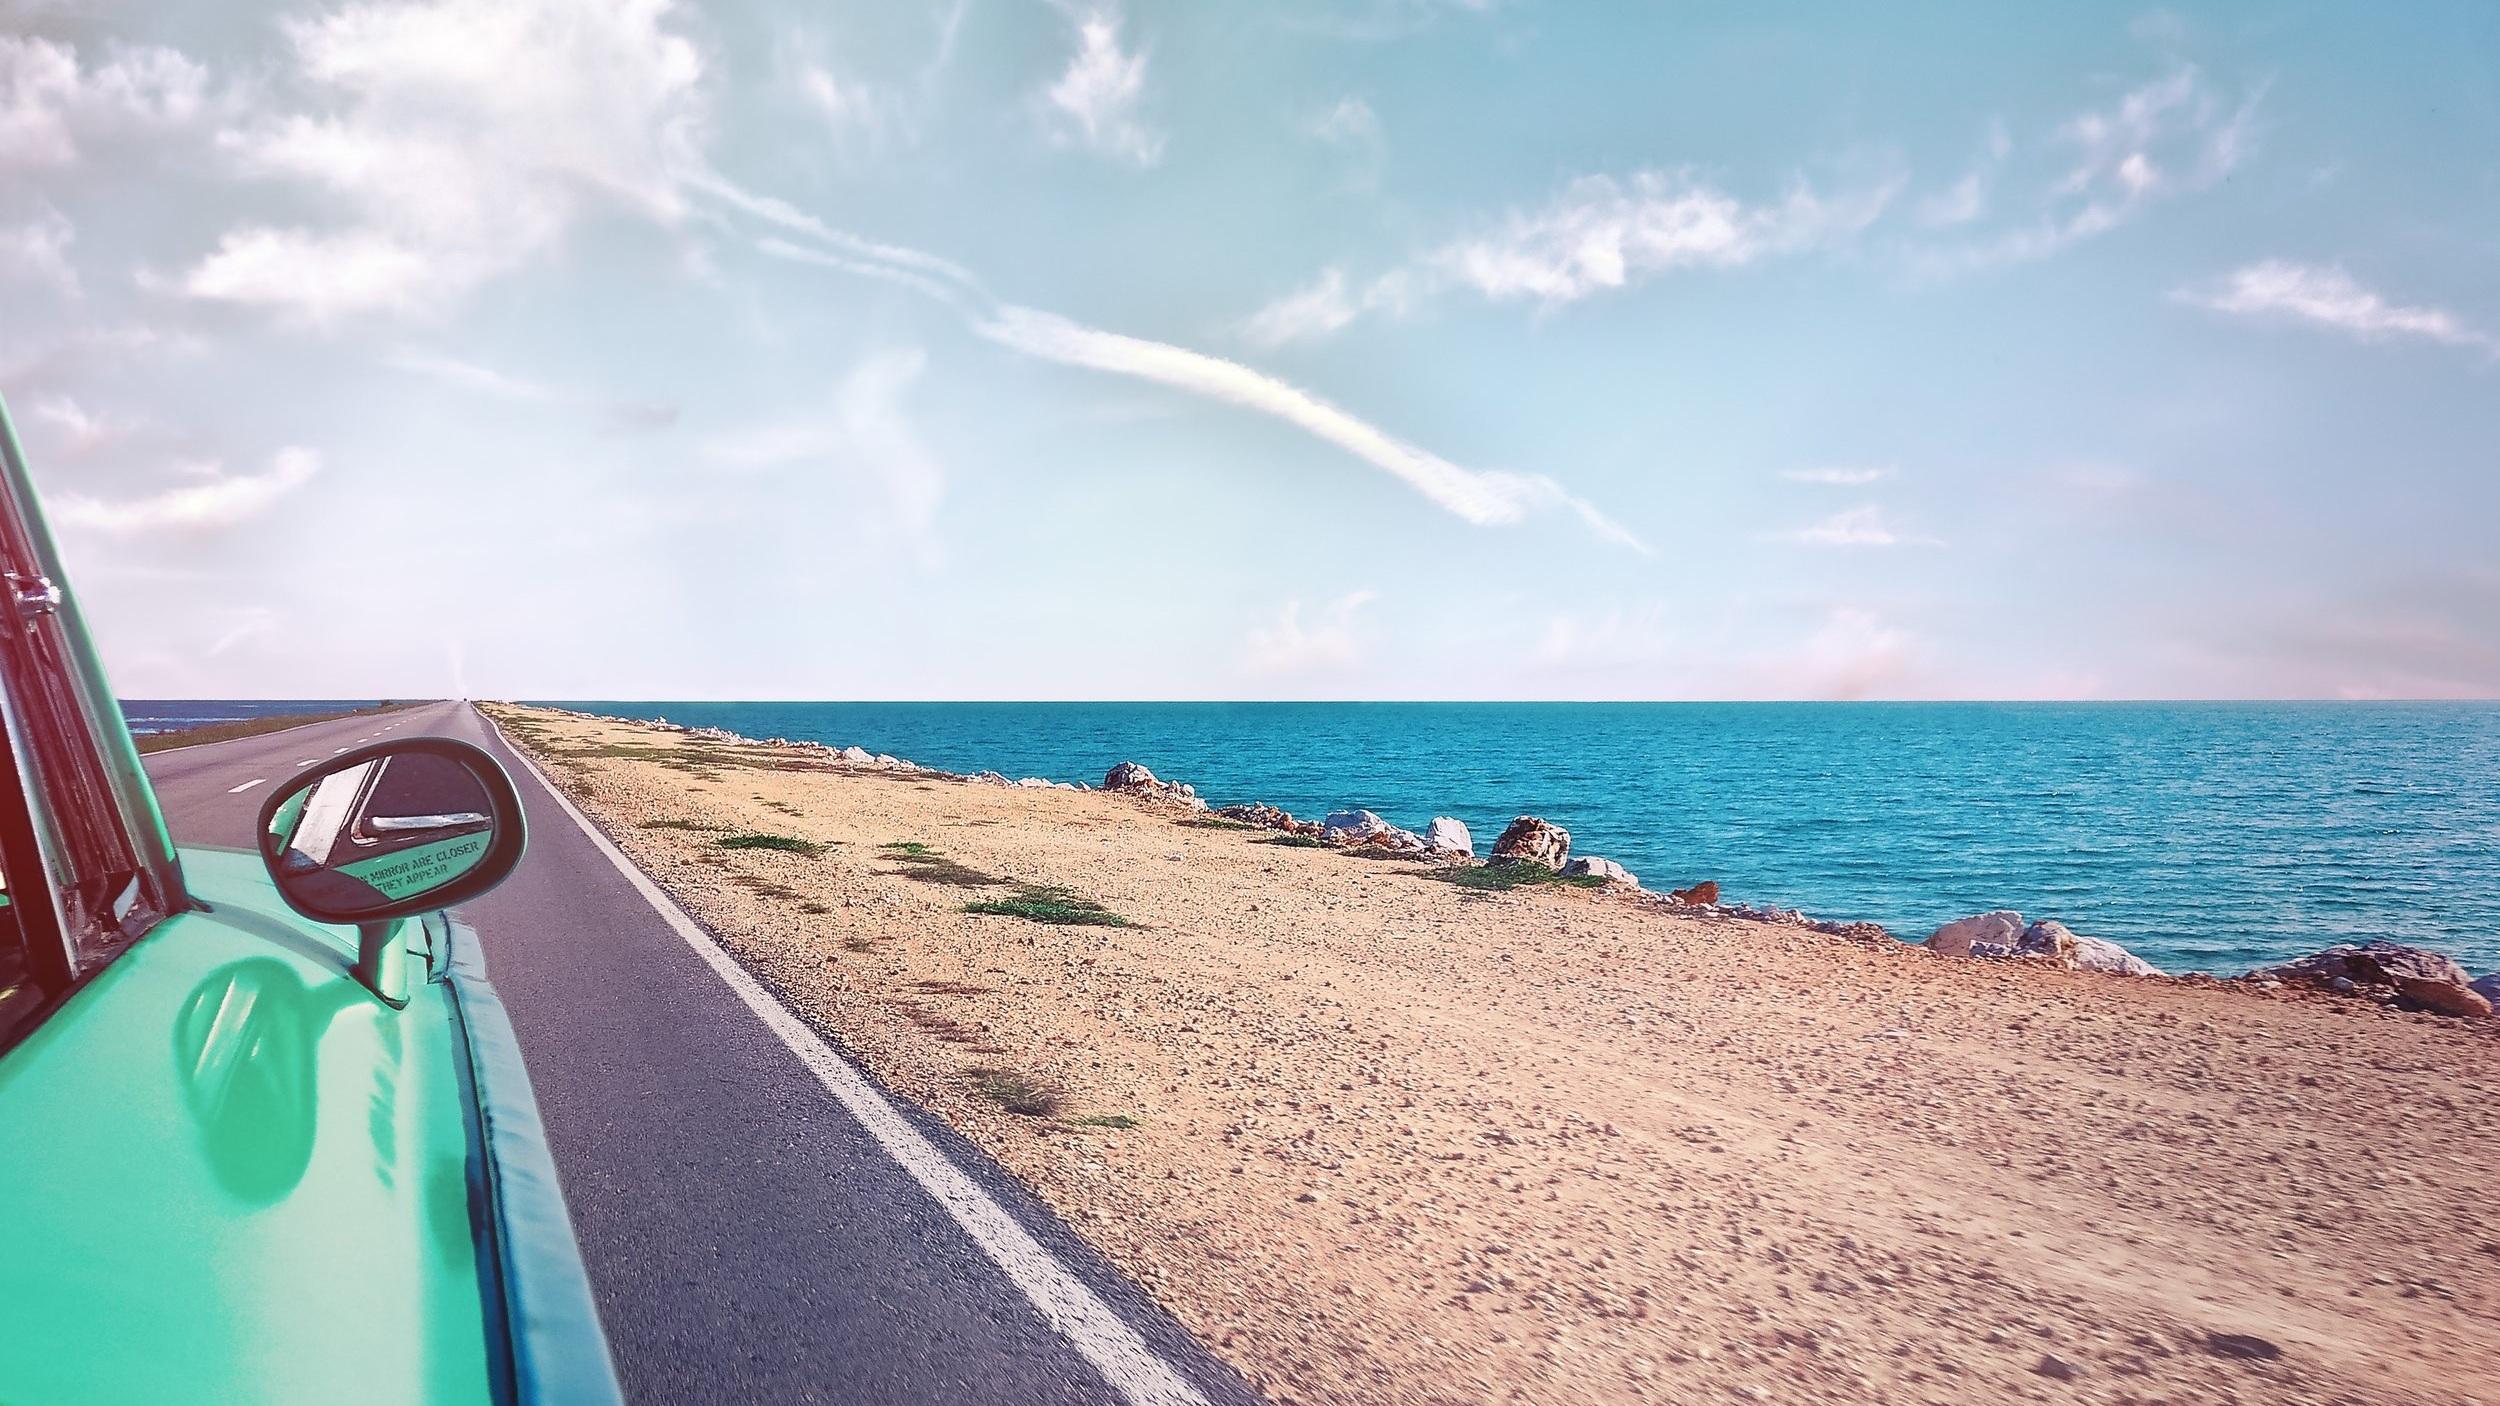 Roadtrip vacation/ Pexels